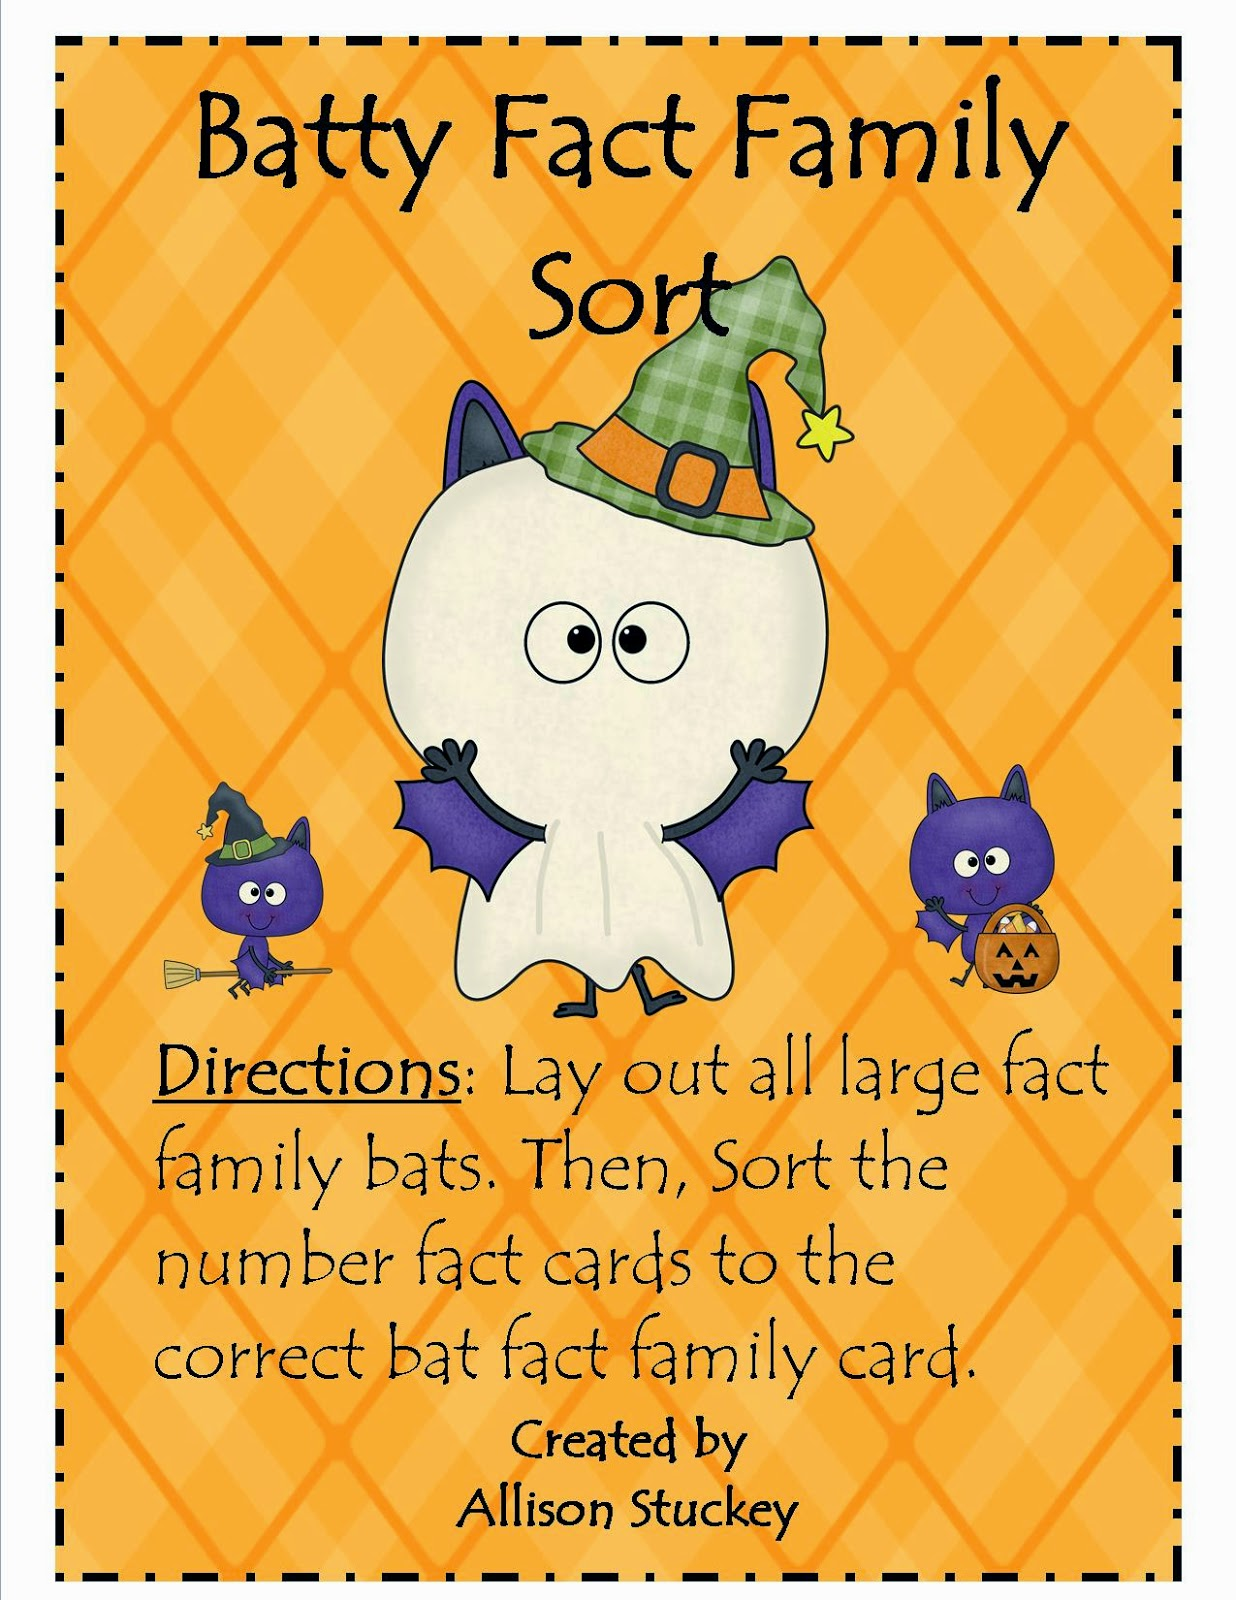 http://www.teacherspayteachers.com/Product/Batty-Fact-Family-Sort-356485